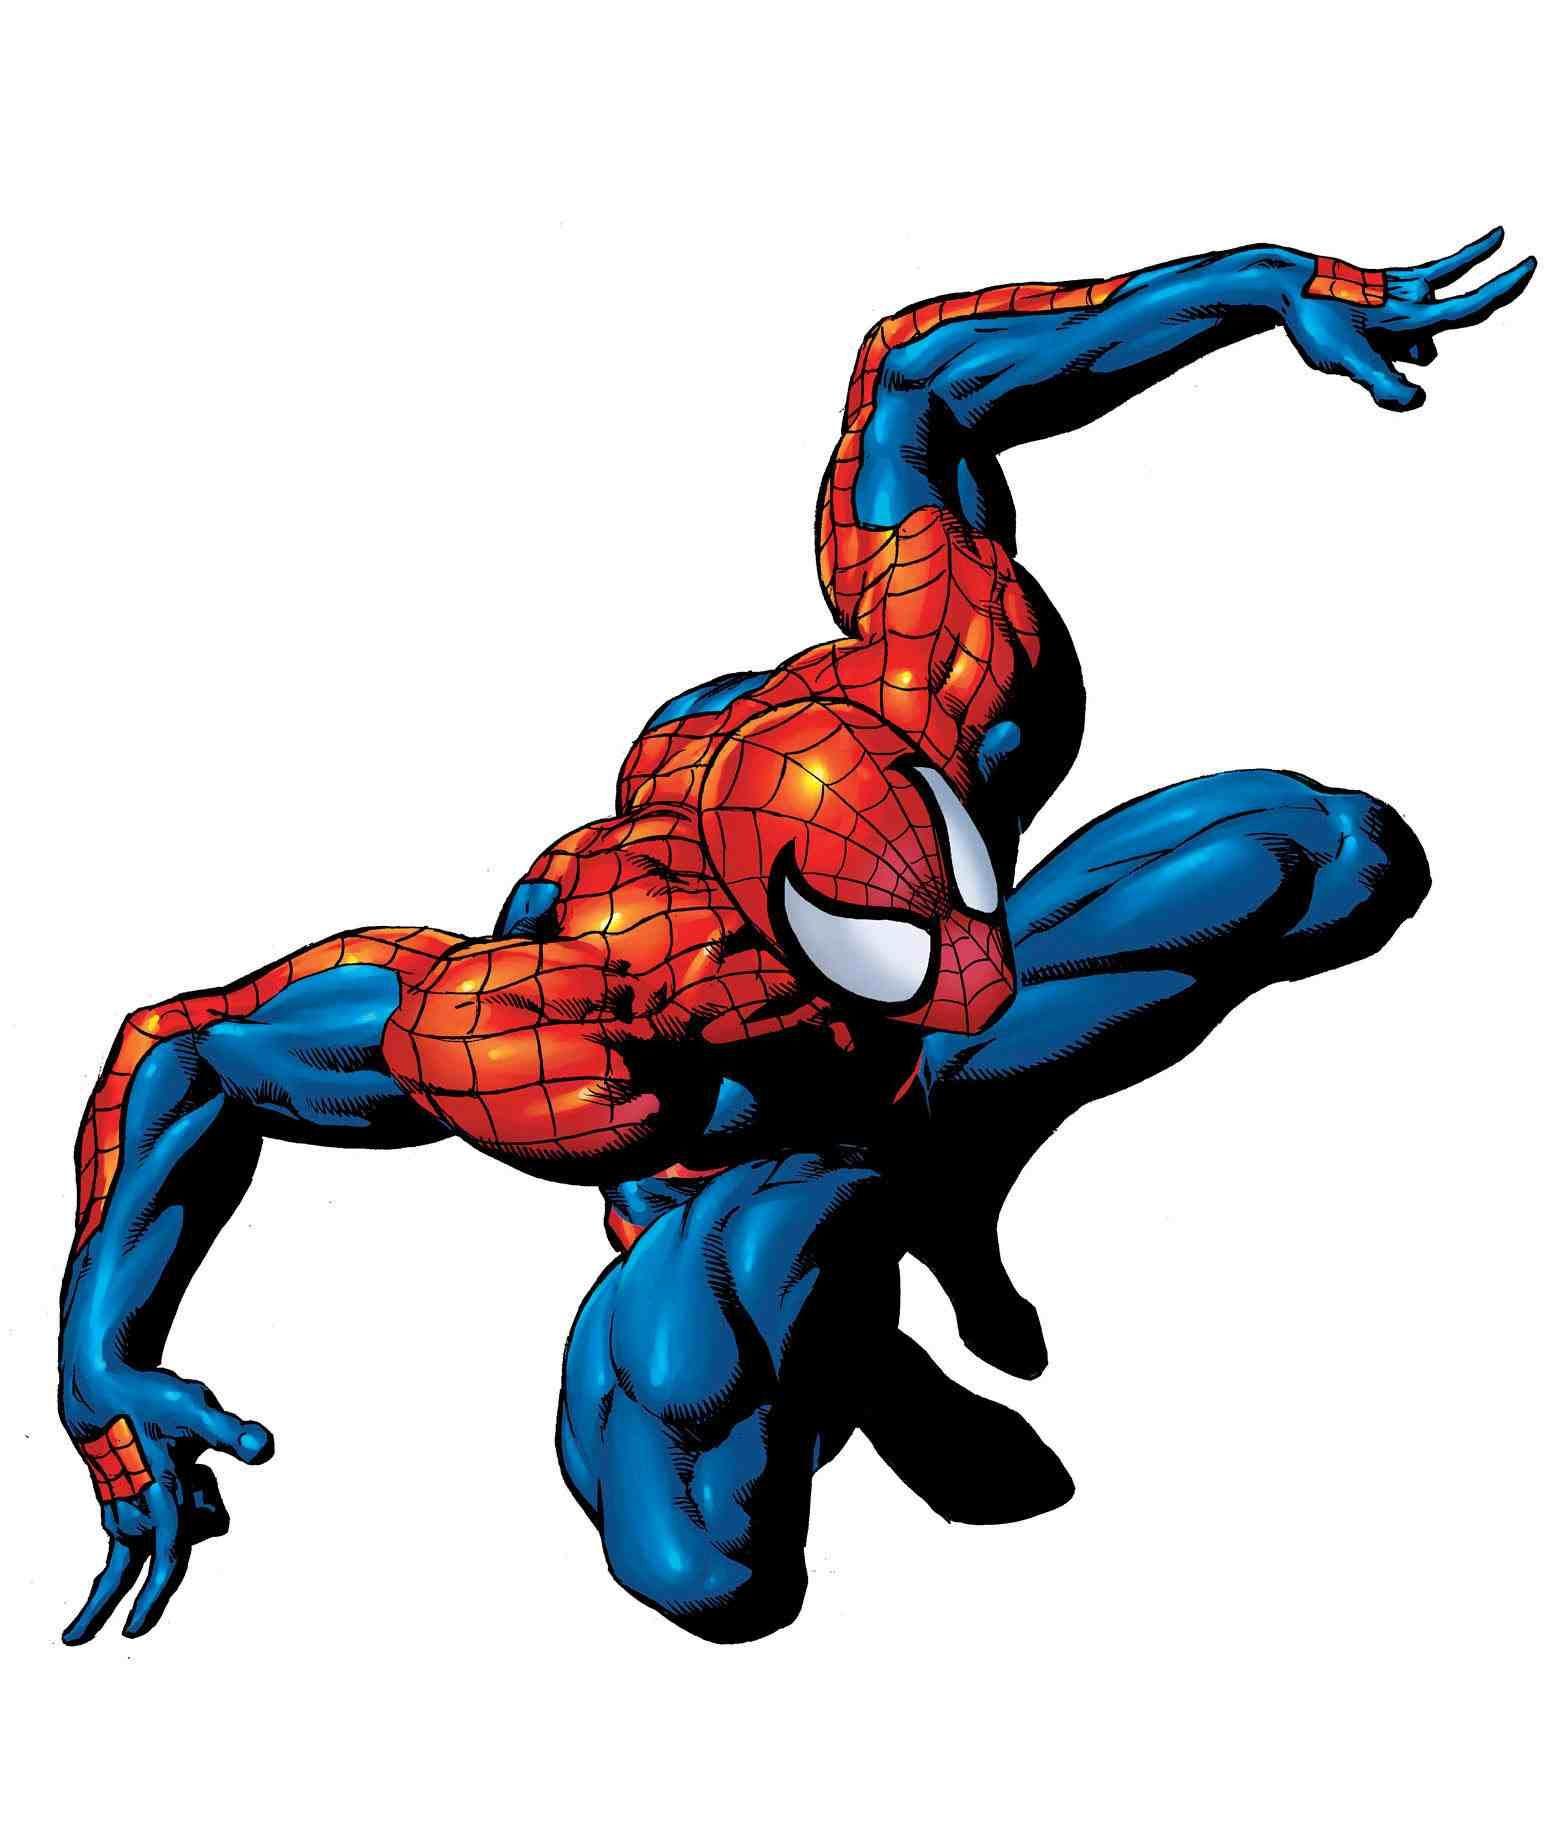 marvel comics characters - Google Search